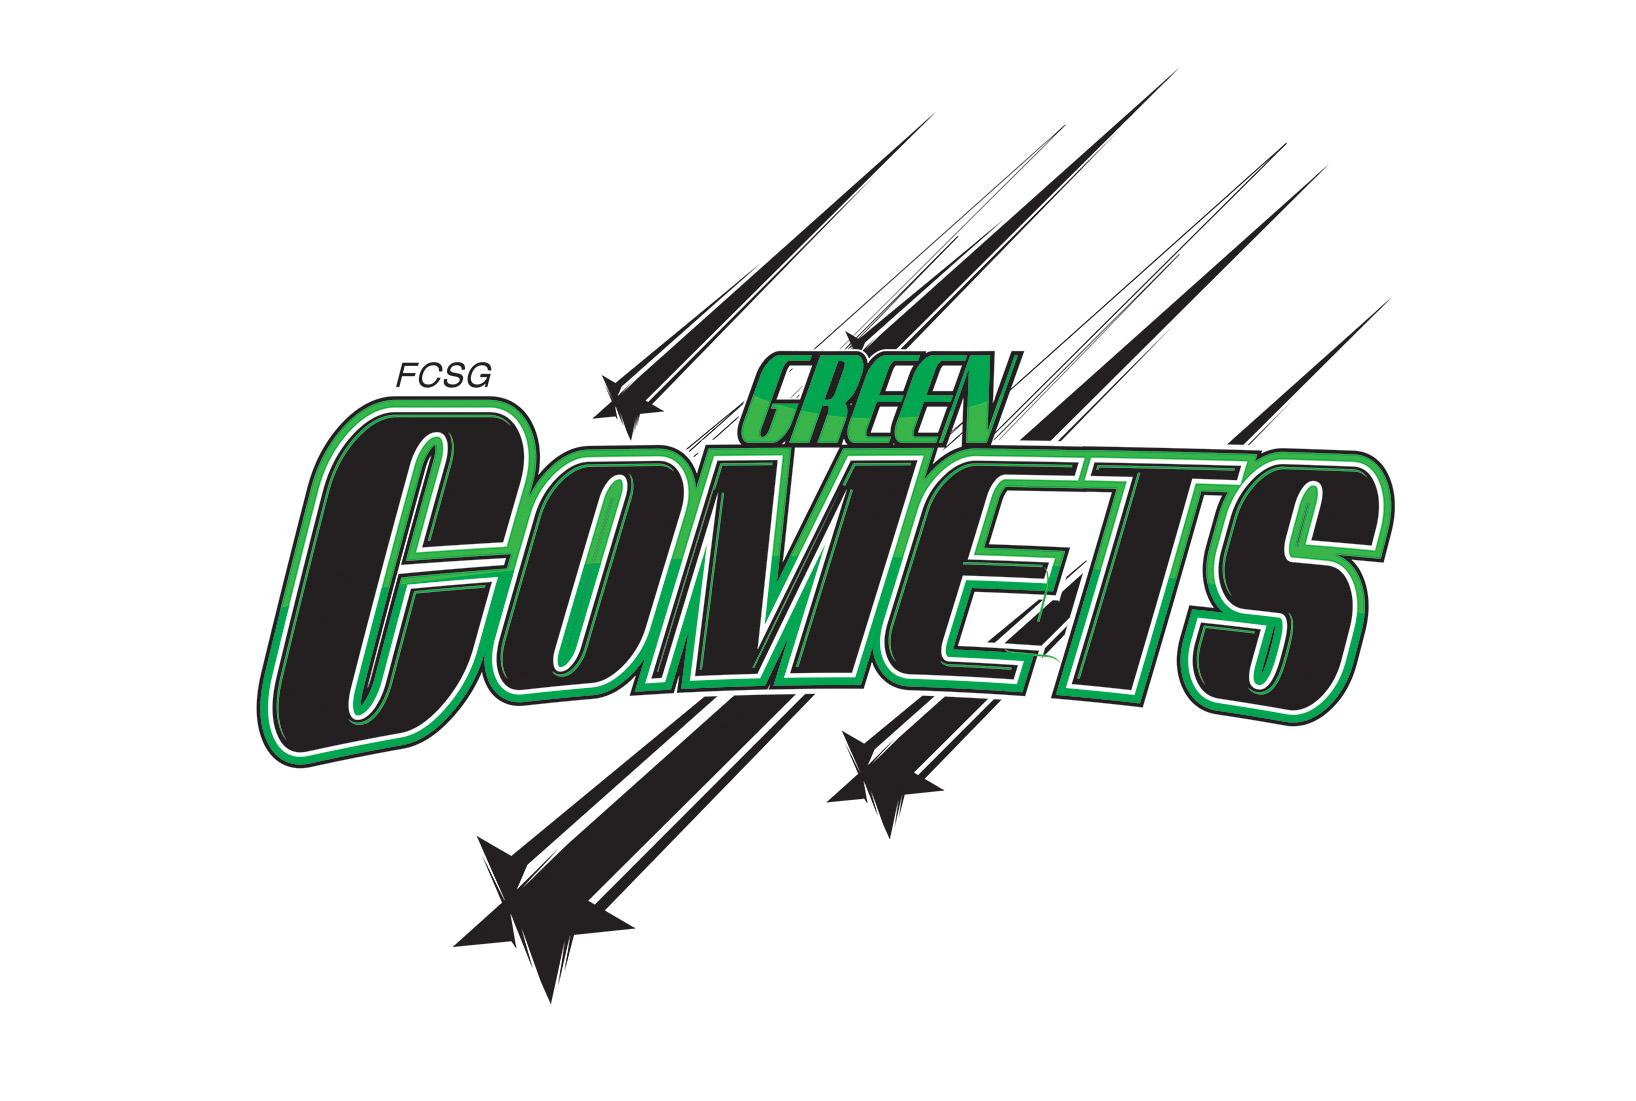 Logo_FCSG_COMETS